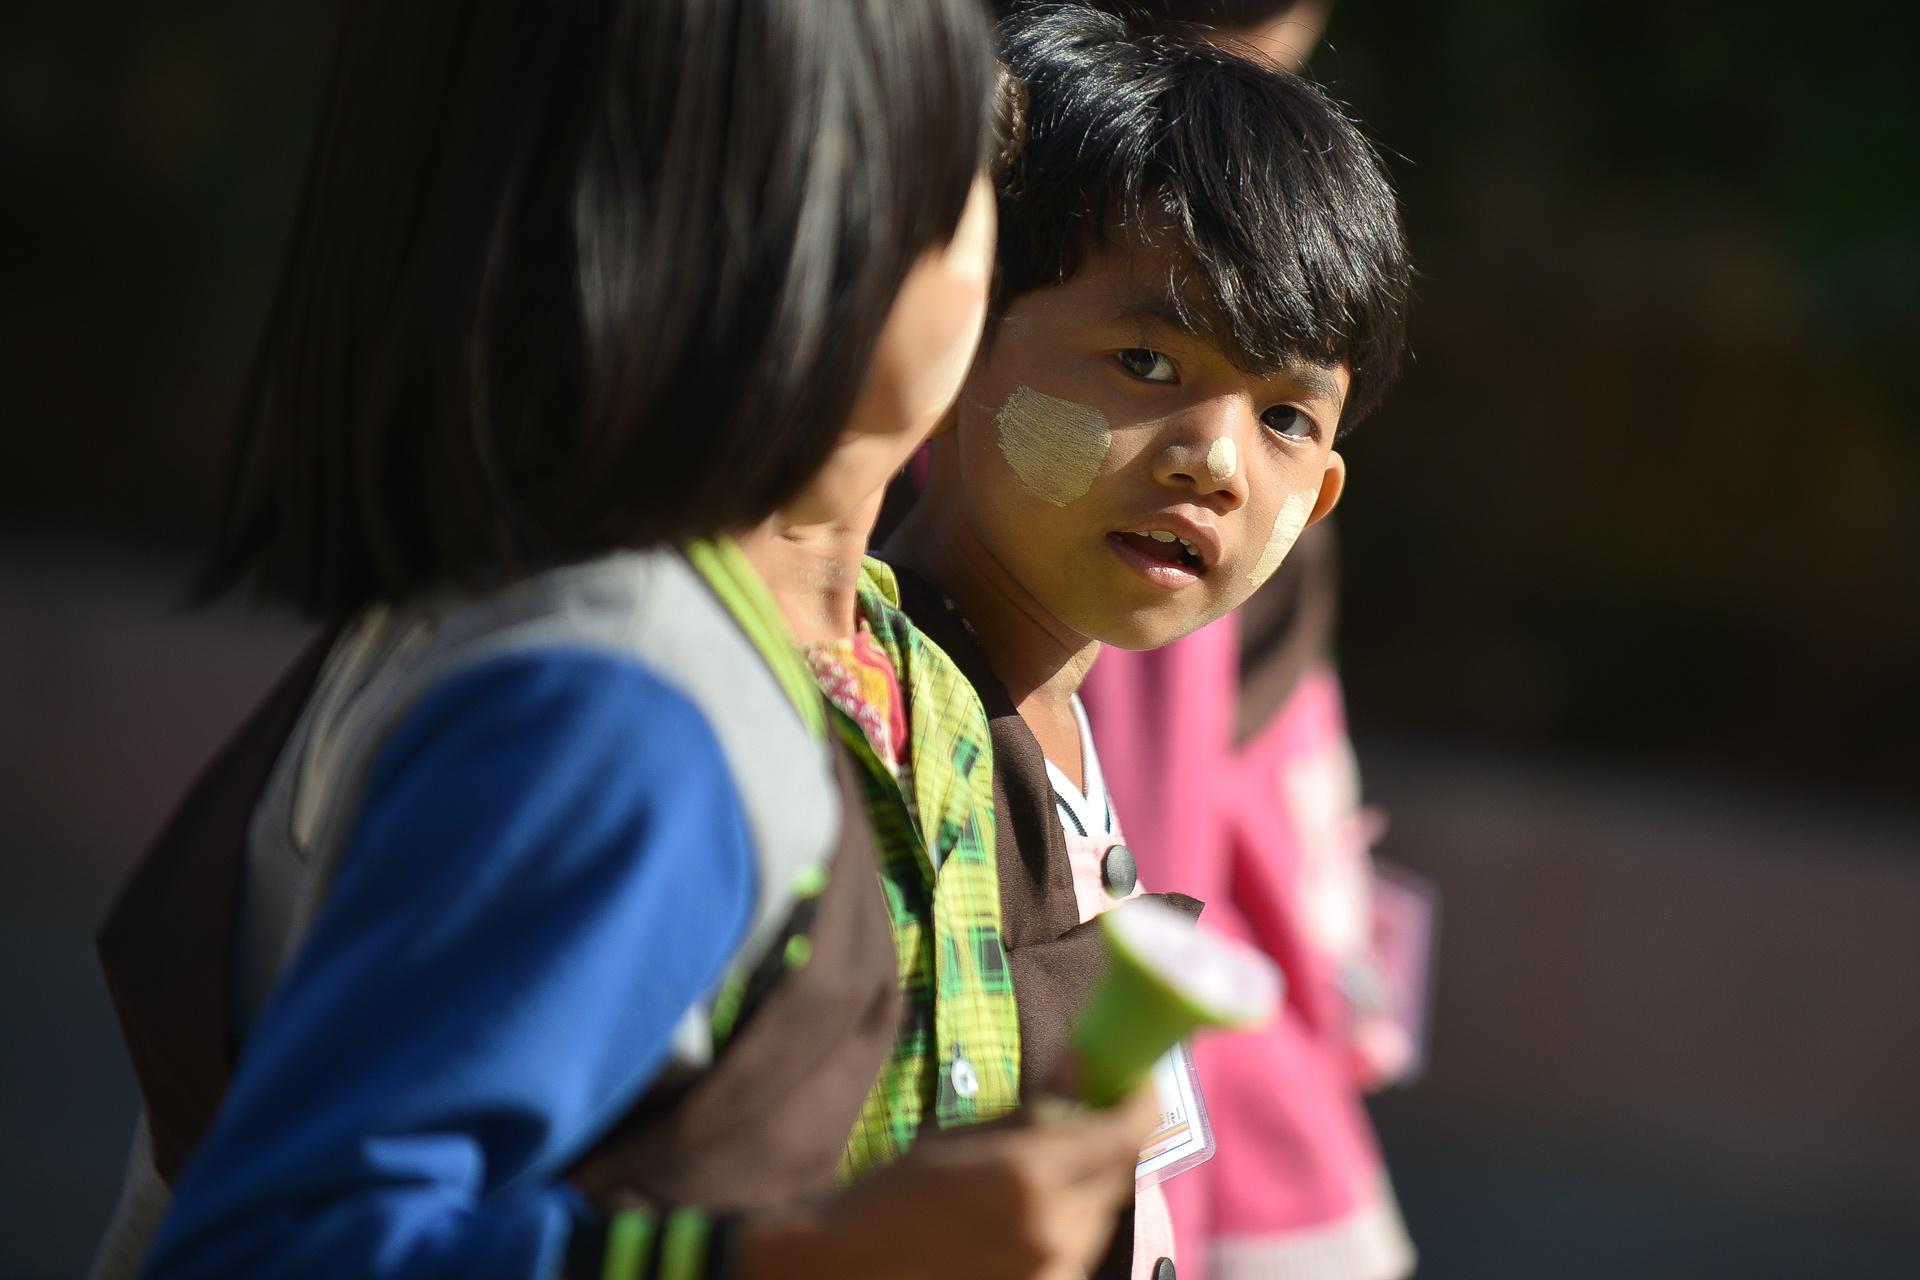 Myanmar - mien dat la ngu quen hinh anh 48